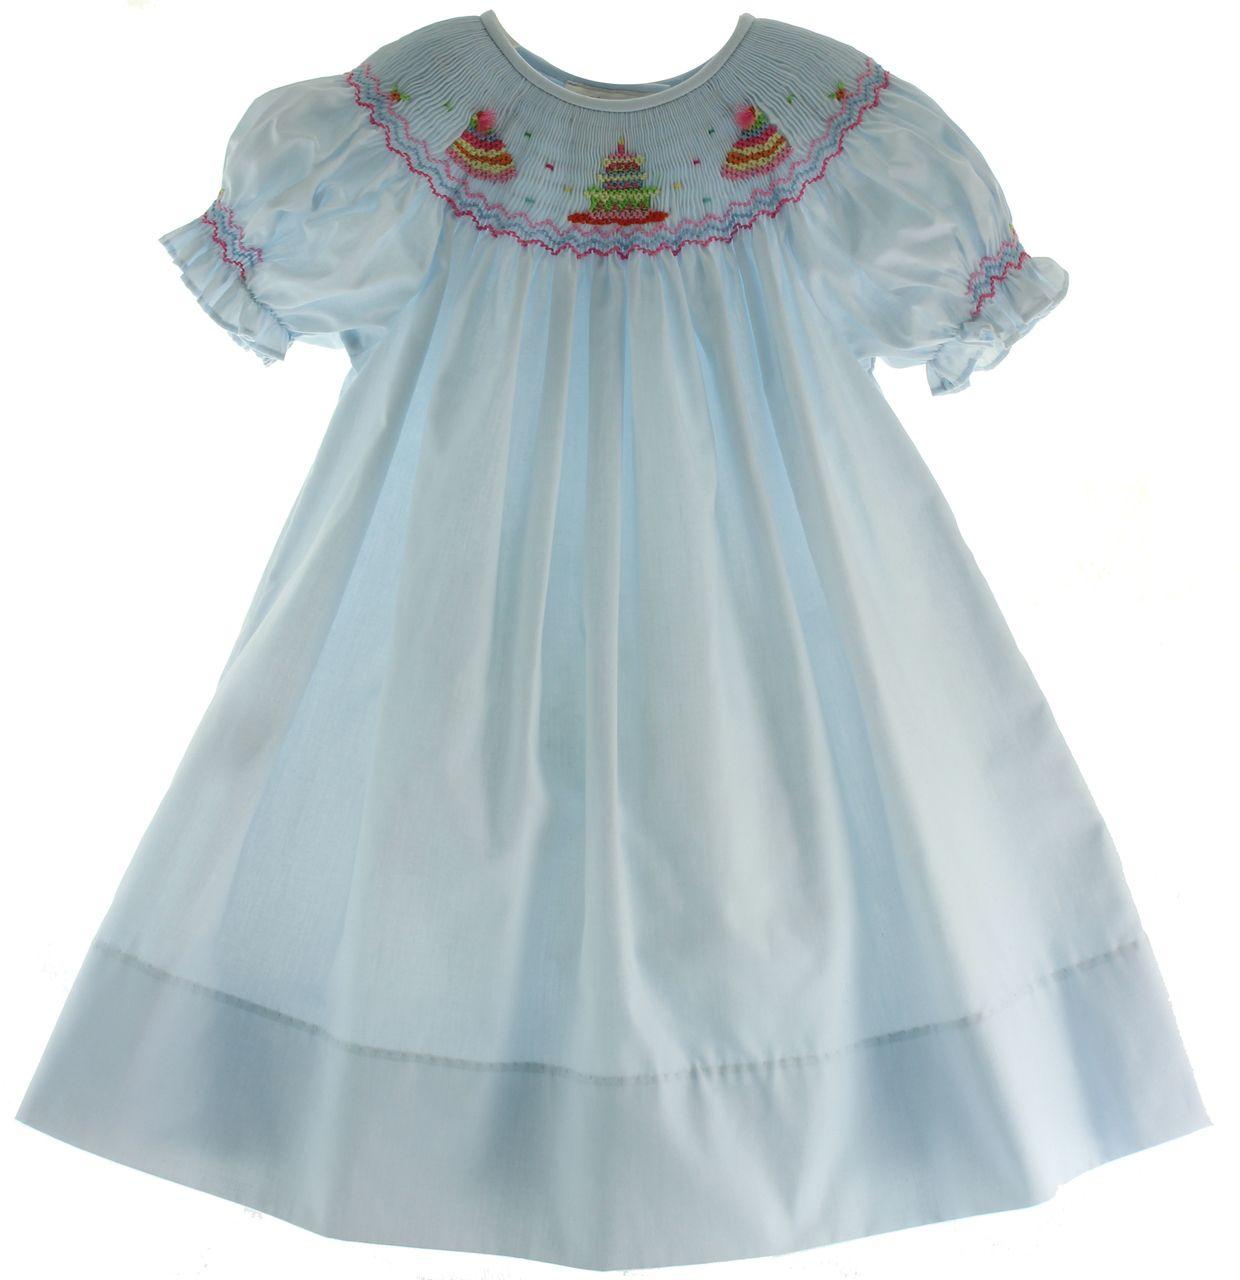 0345b884c Girls Smocked Dresses, Baby Girl Dresses, Baby Dress, Baby Girls, Girl  Outfits